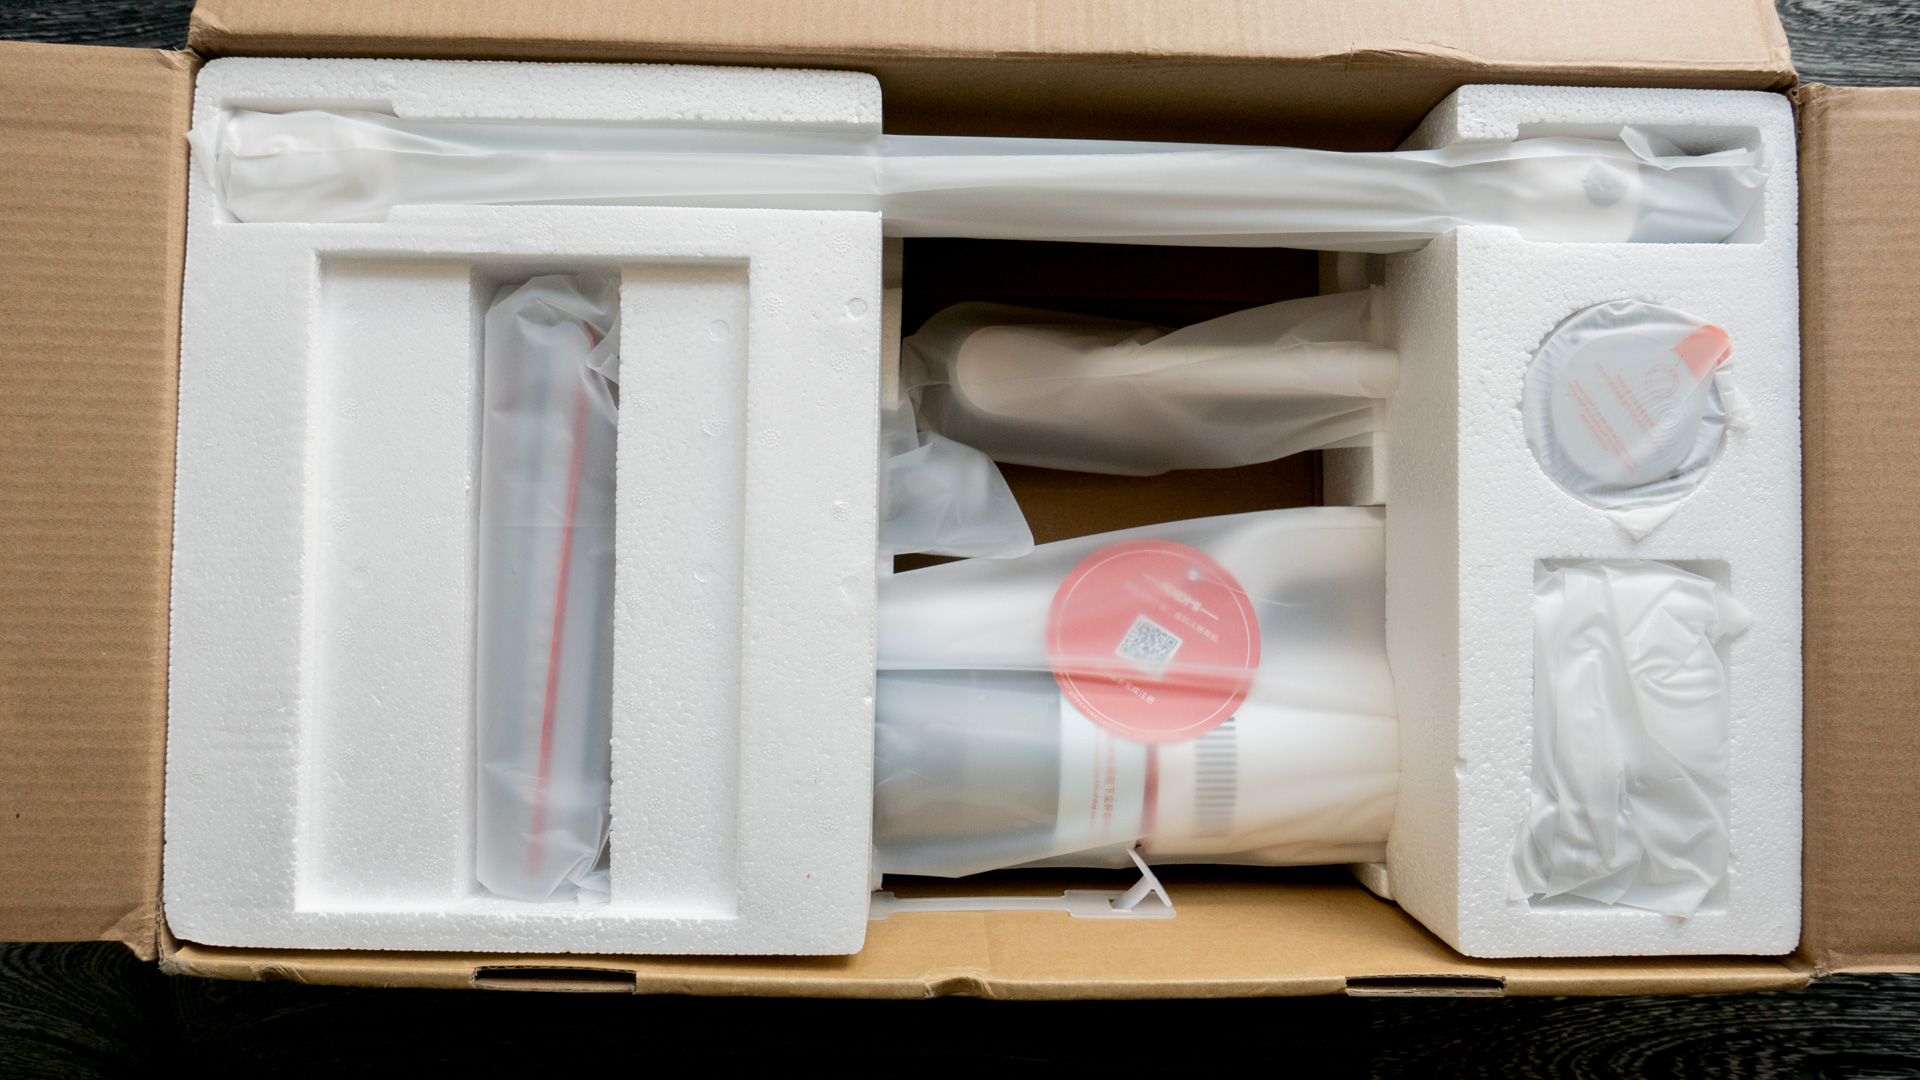 Xiaomi Roidmi Unboxing 06